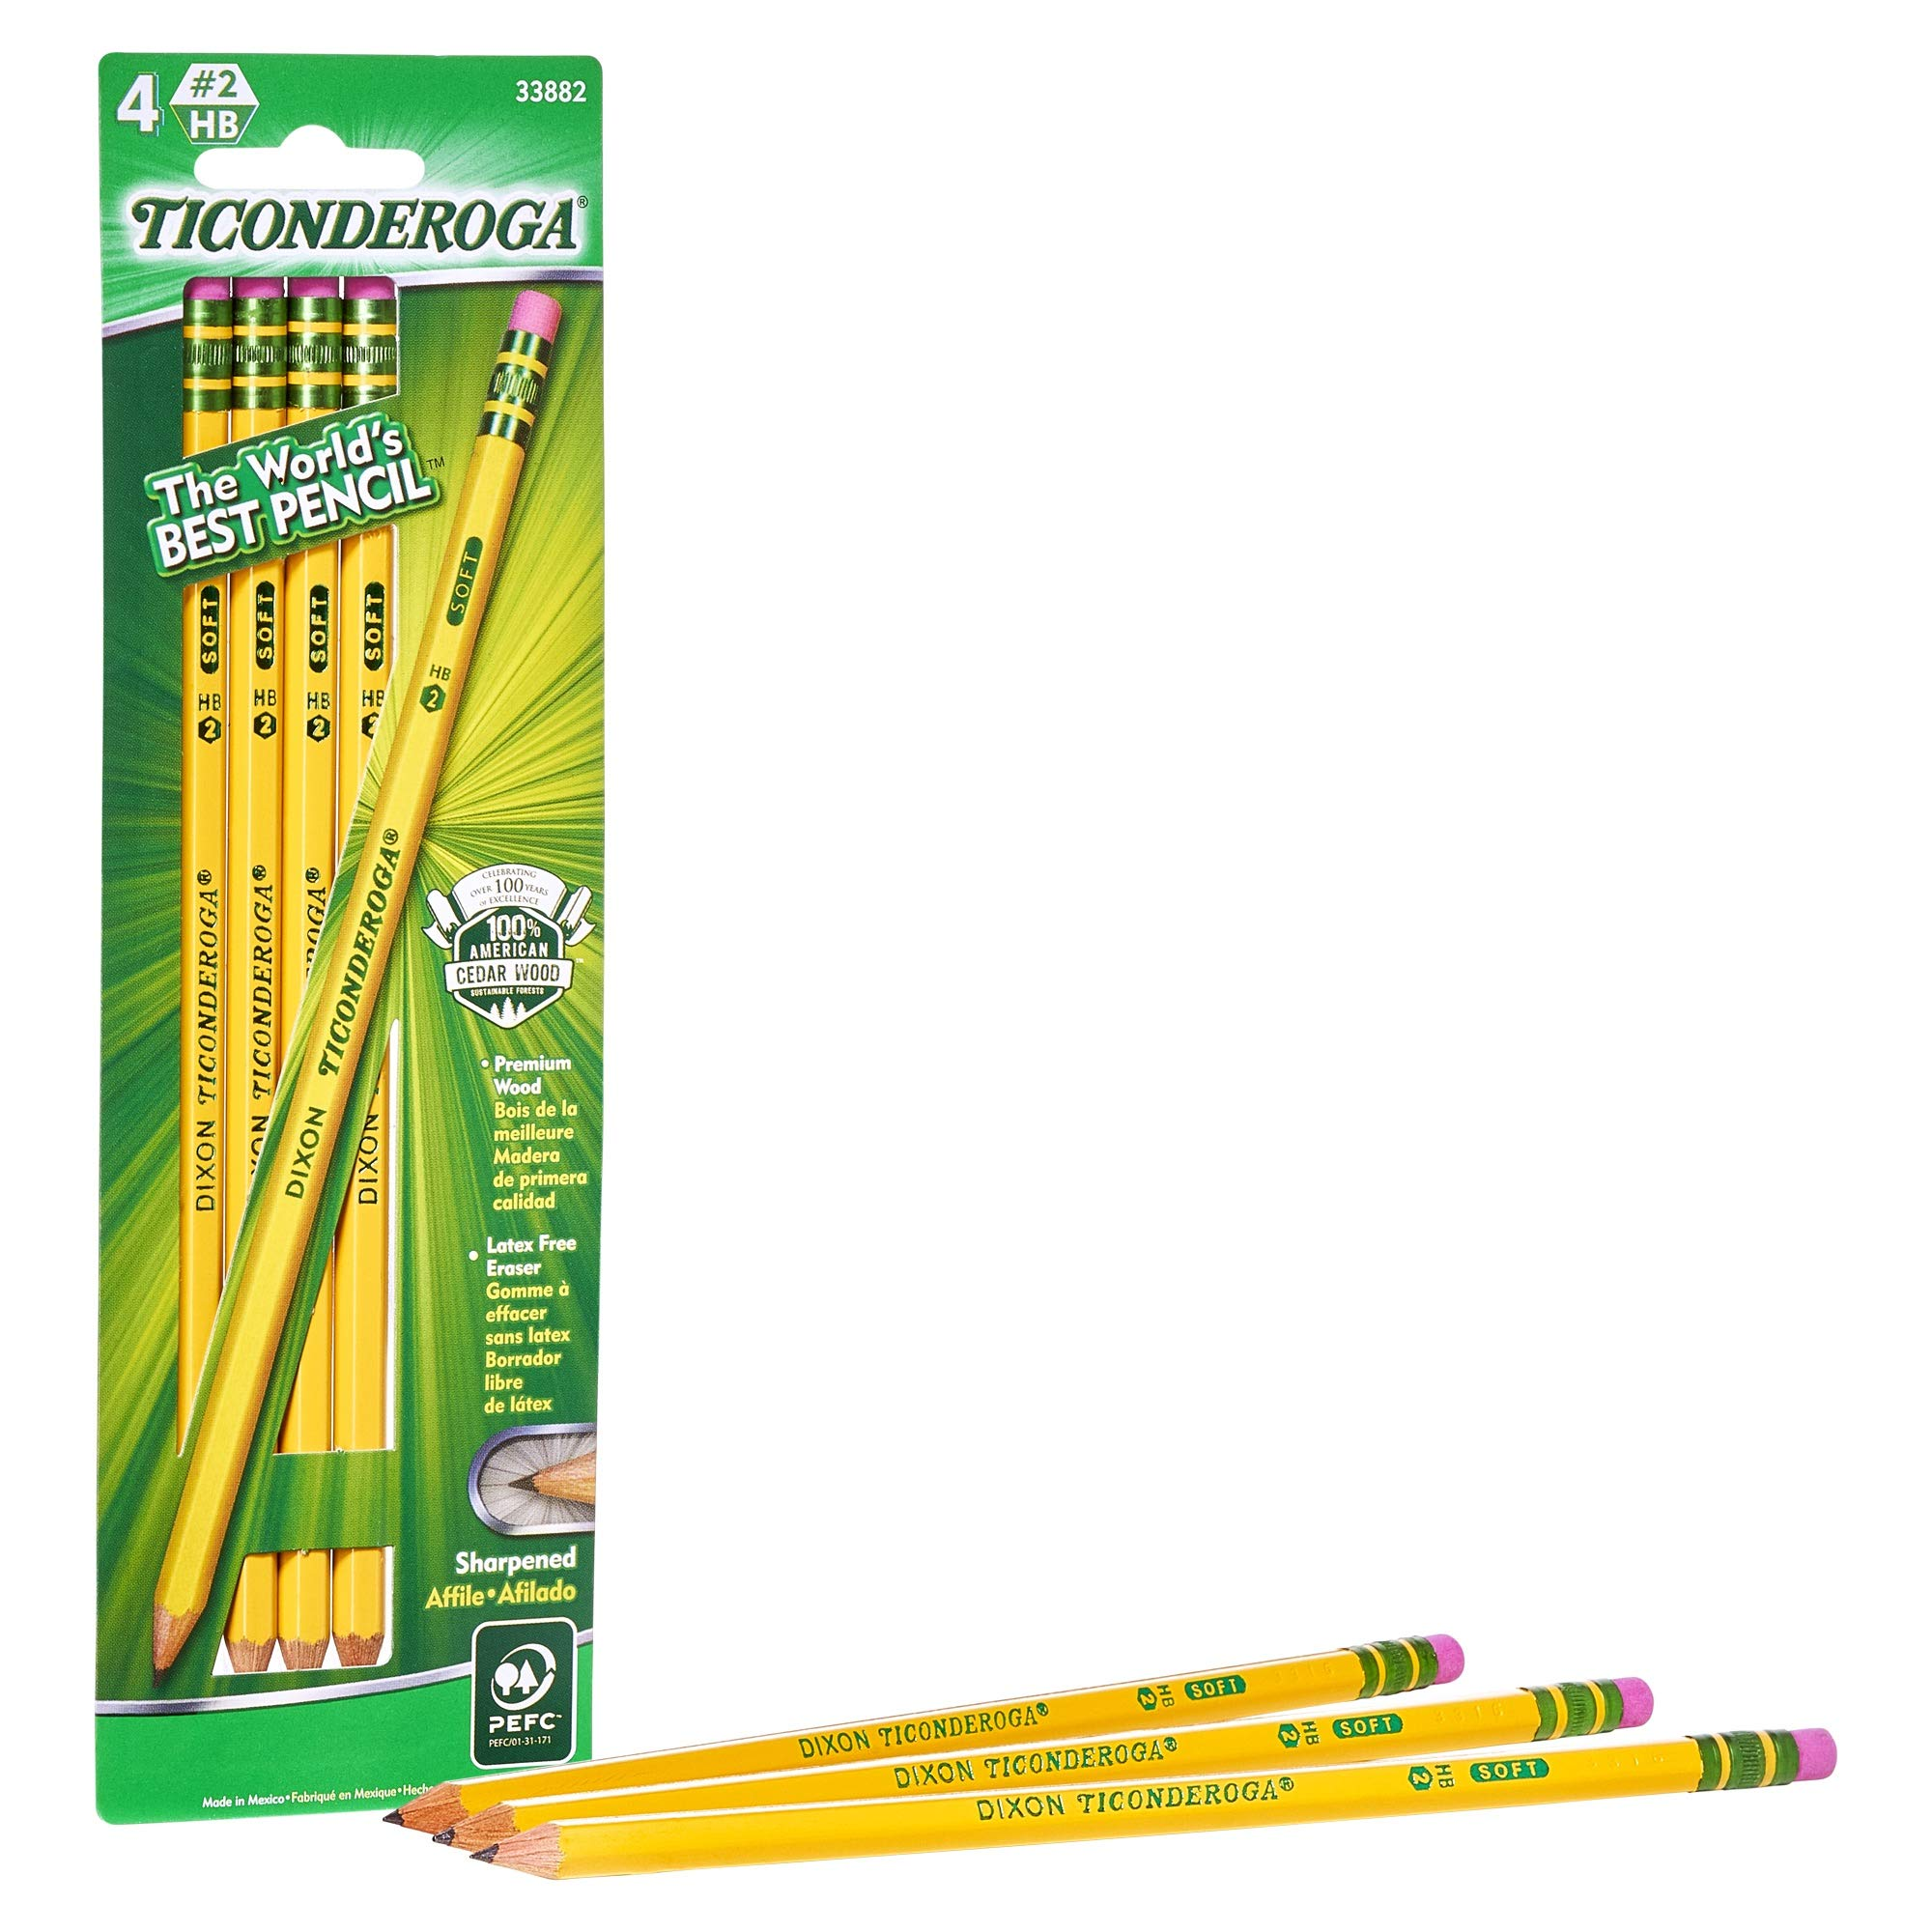 TICONDEROGA Pencils, Wood-Cased, Pre-Sharpened, Graphite #2 HB Soft, Yellow, 4-Pack (33882)